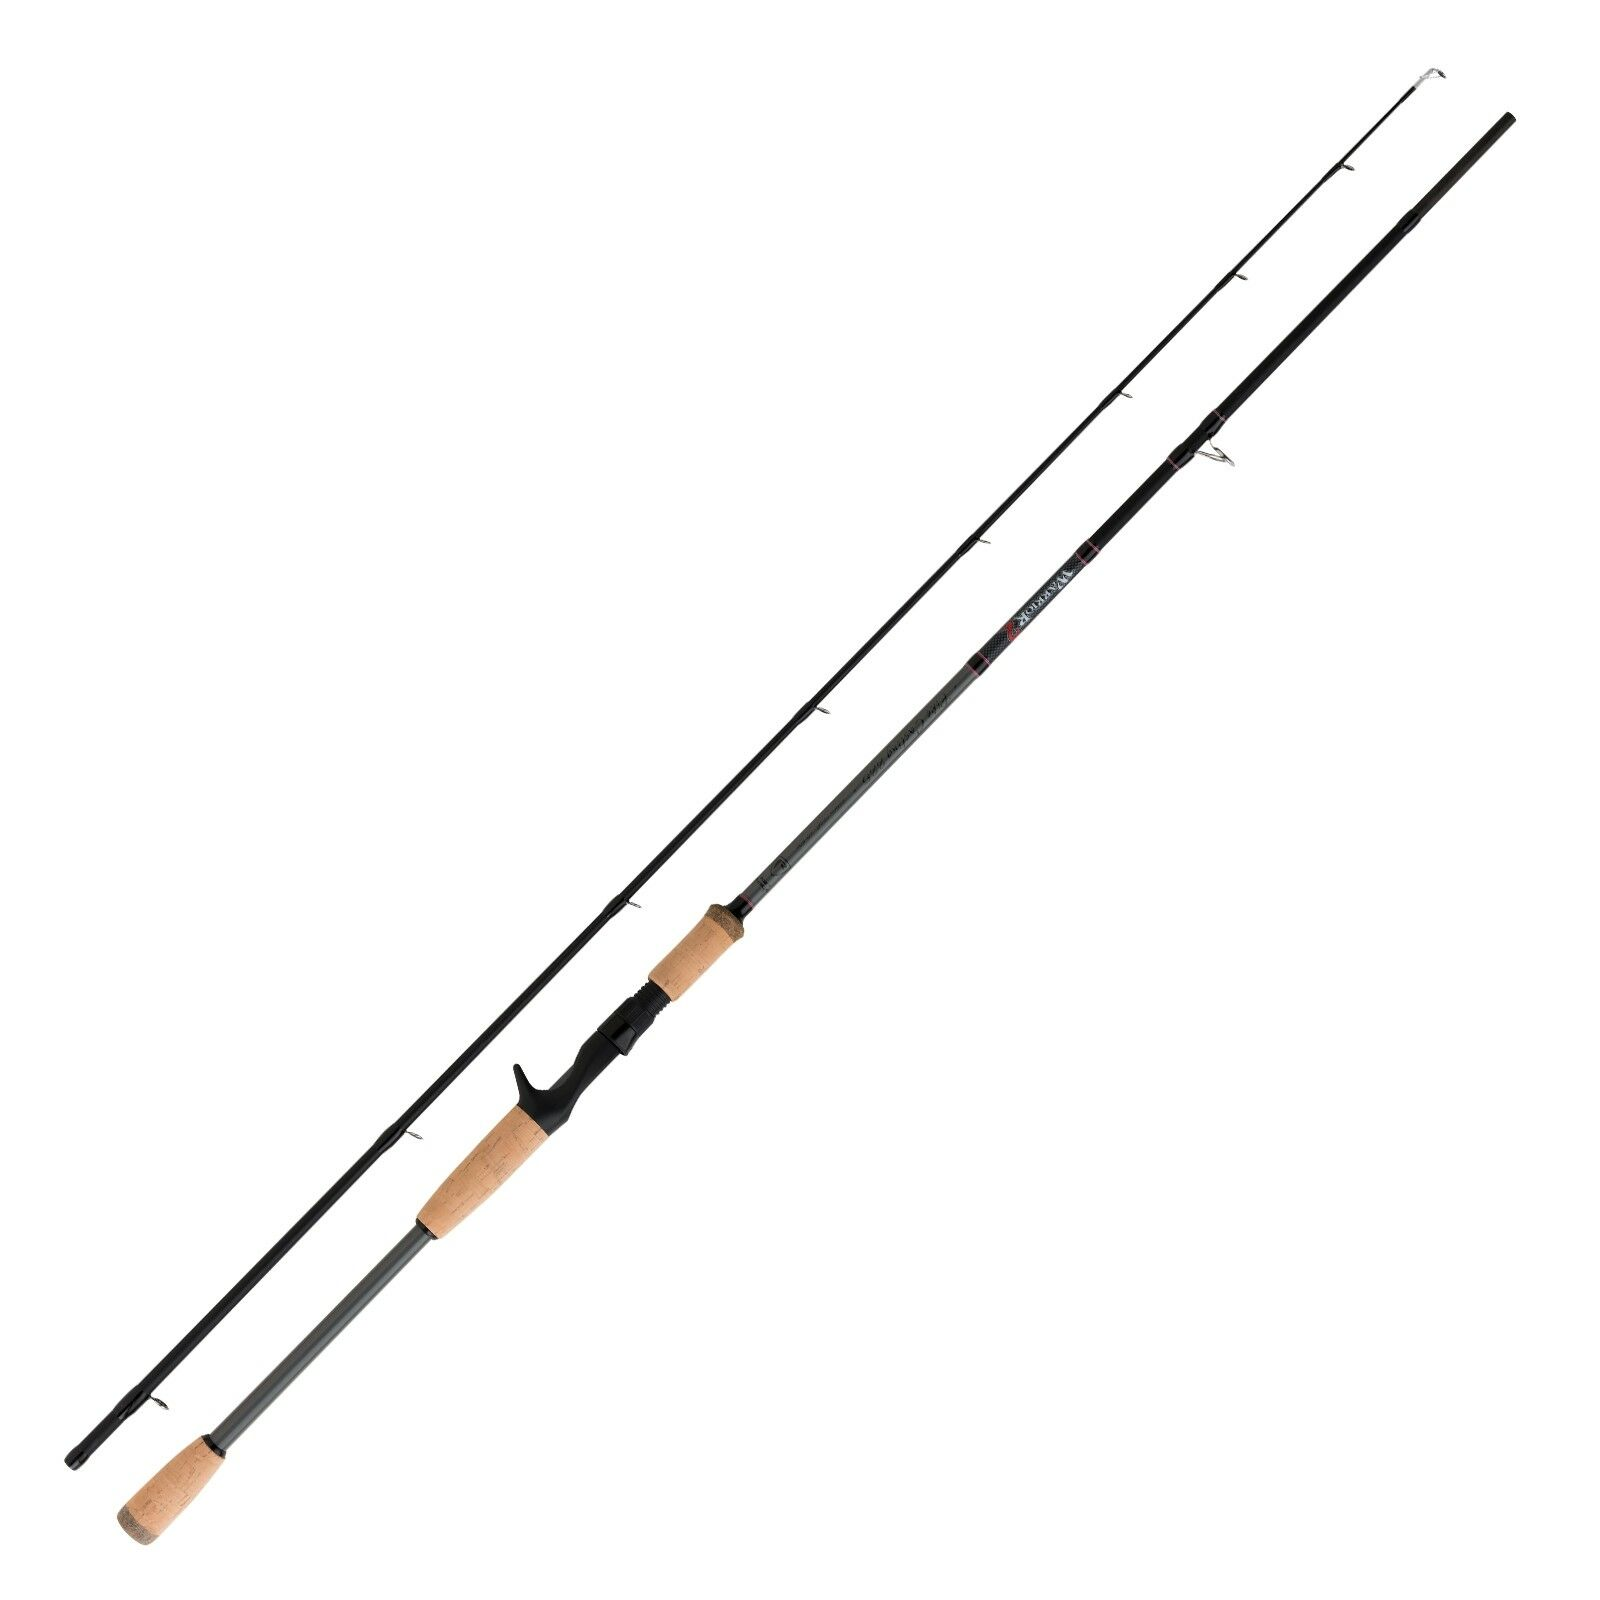 Fox Rage Angelrute Baitcastrute - Warrior 2 Pike Casting Rod 2,25m 20-80g 2 Teil